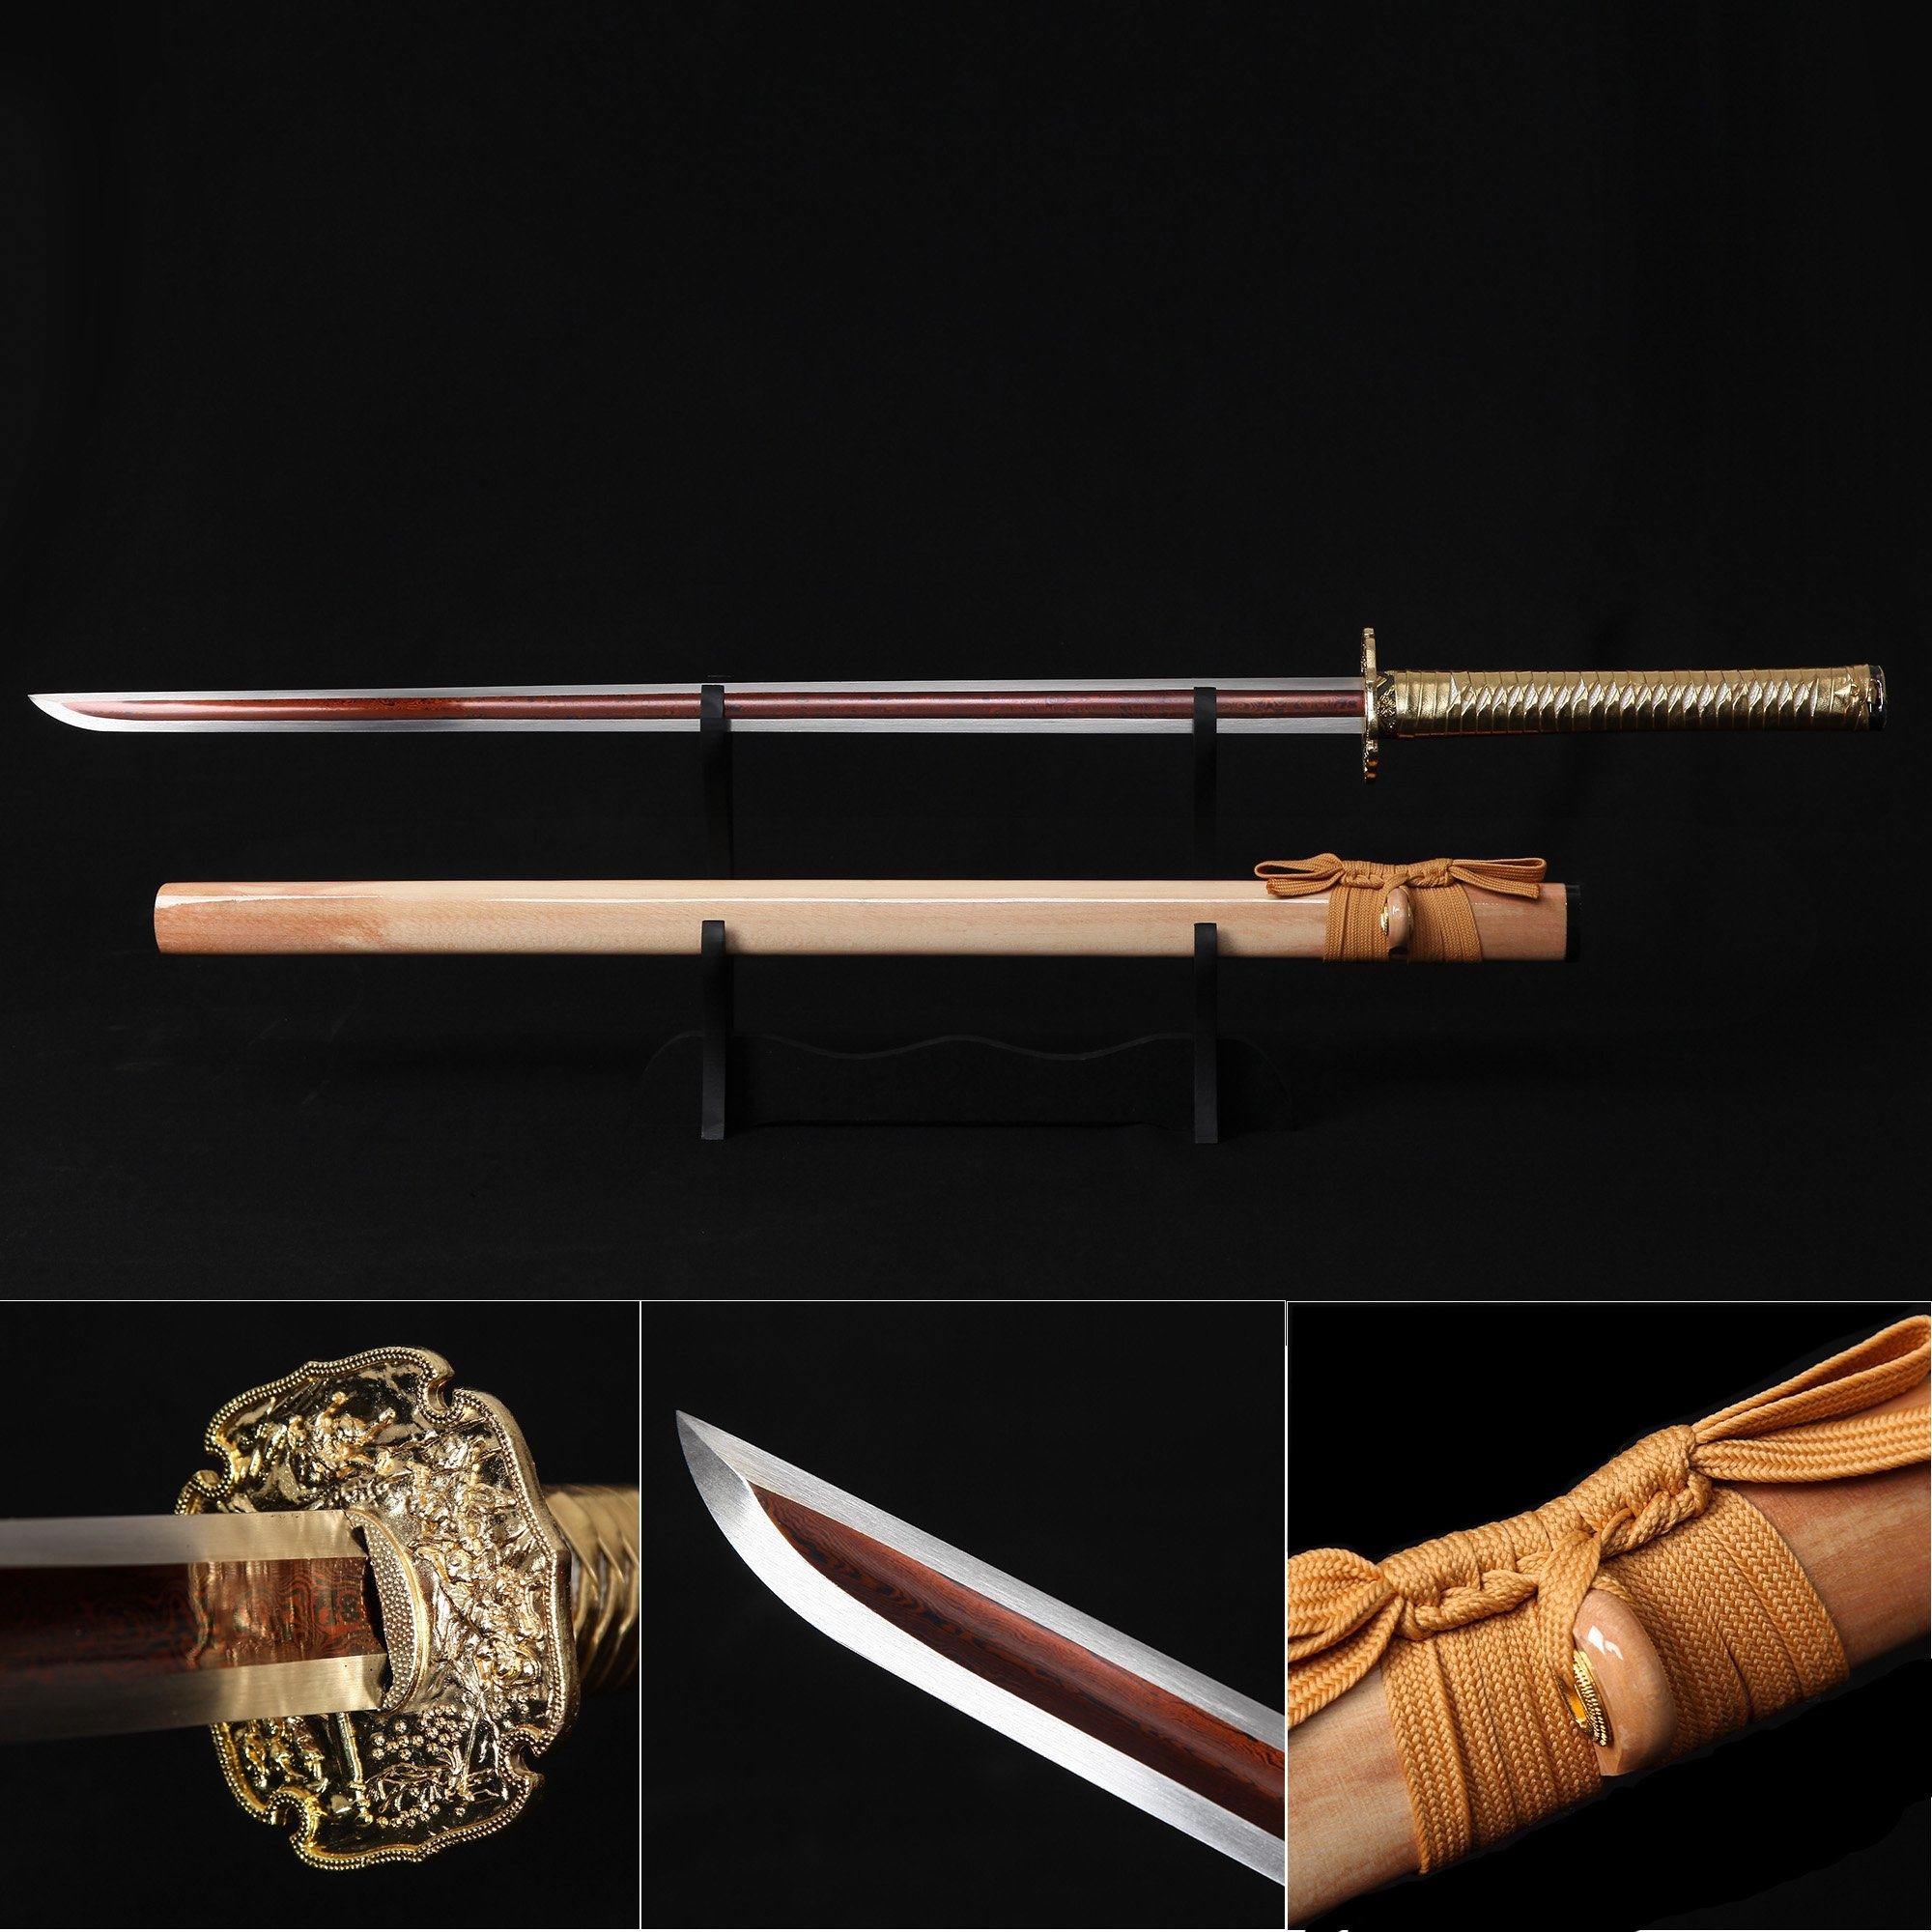 Handmade Two Side Blade Gold Japanese Real Ninjato Ninja Swords Samurai Swords